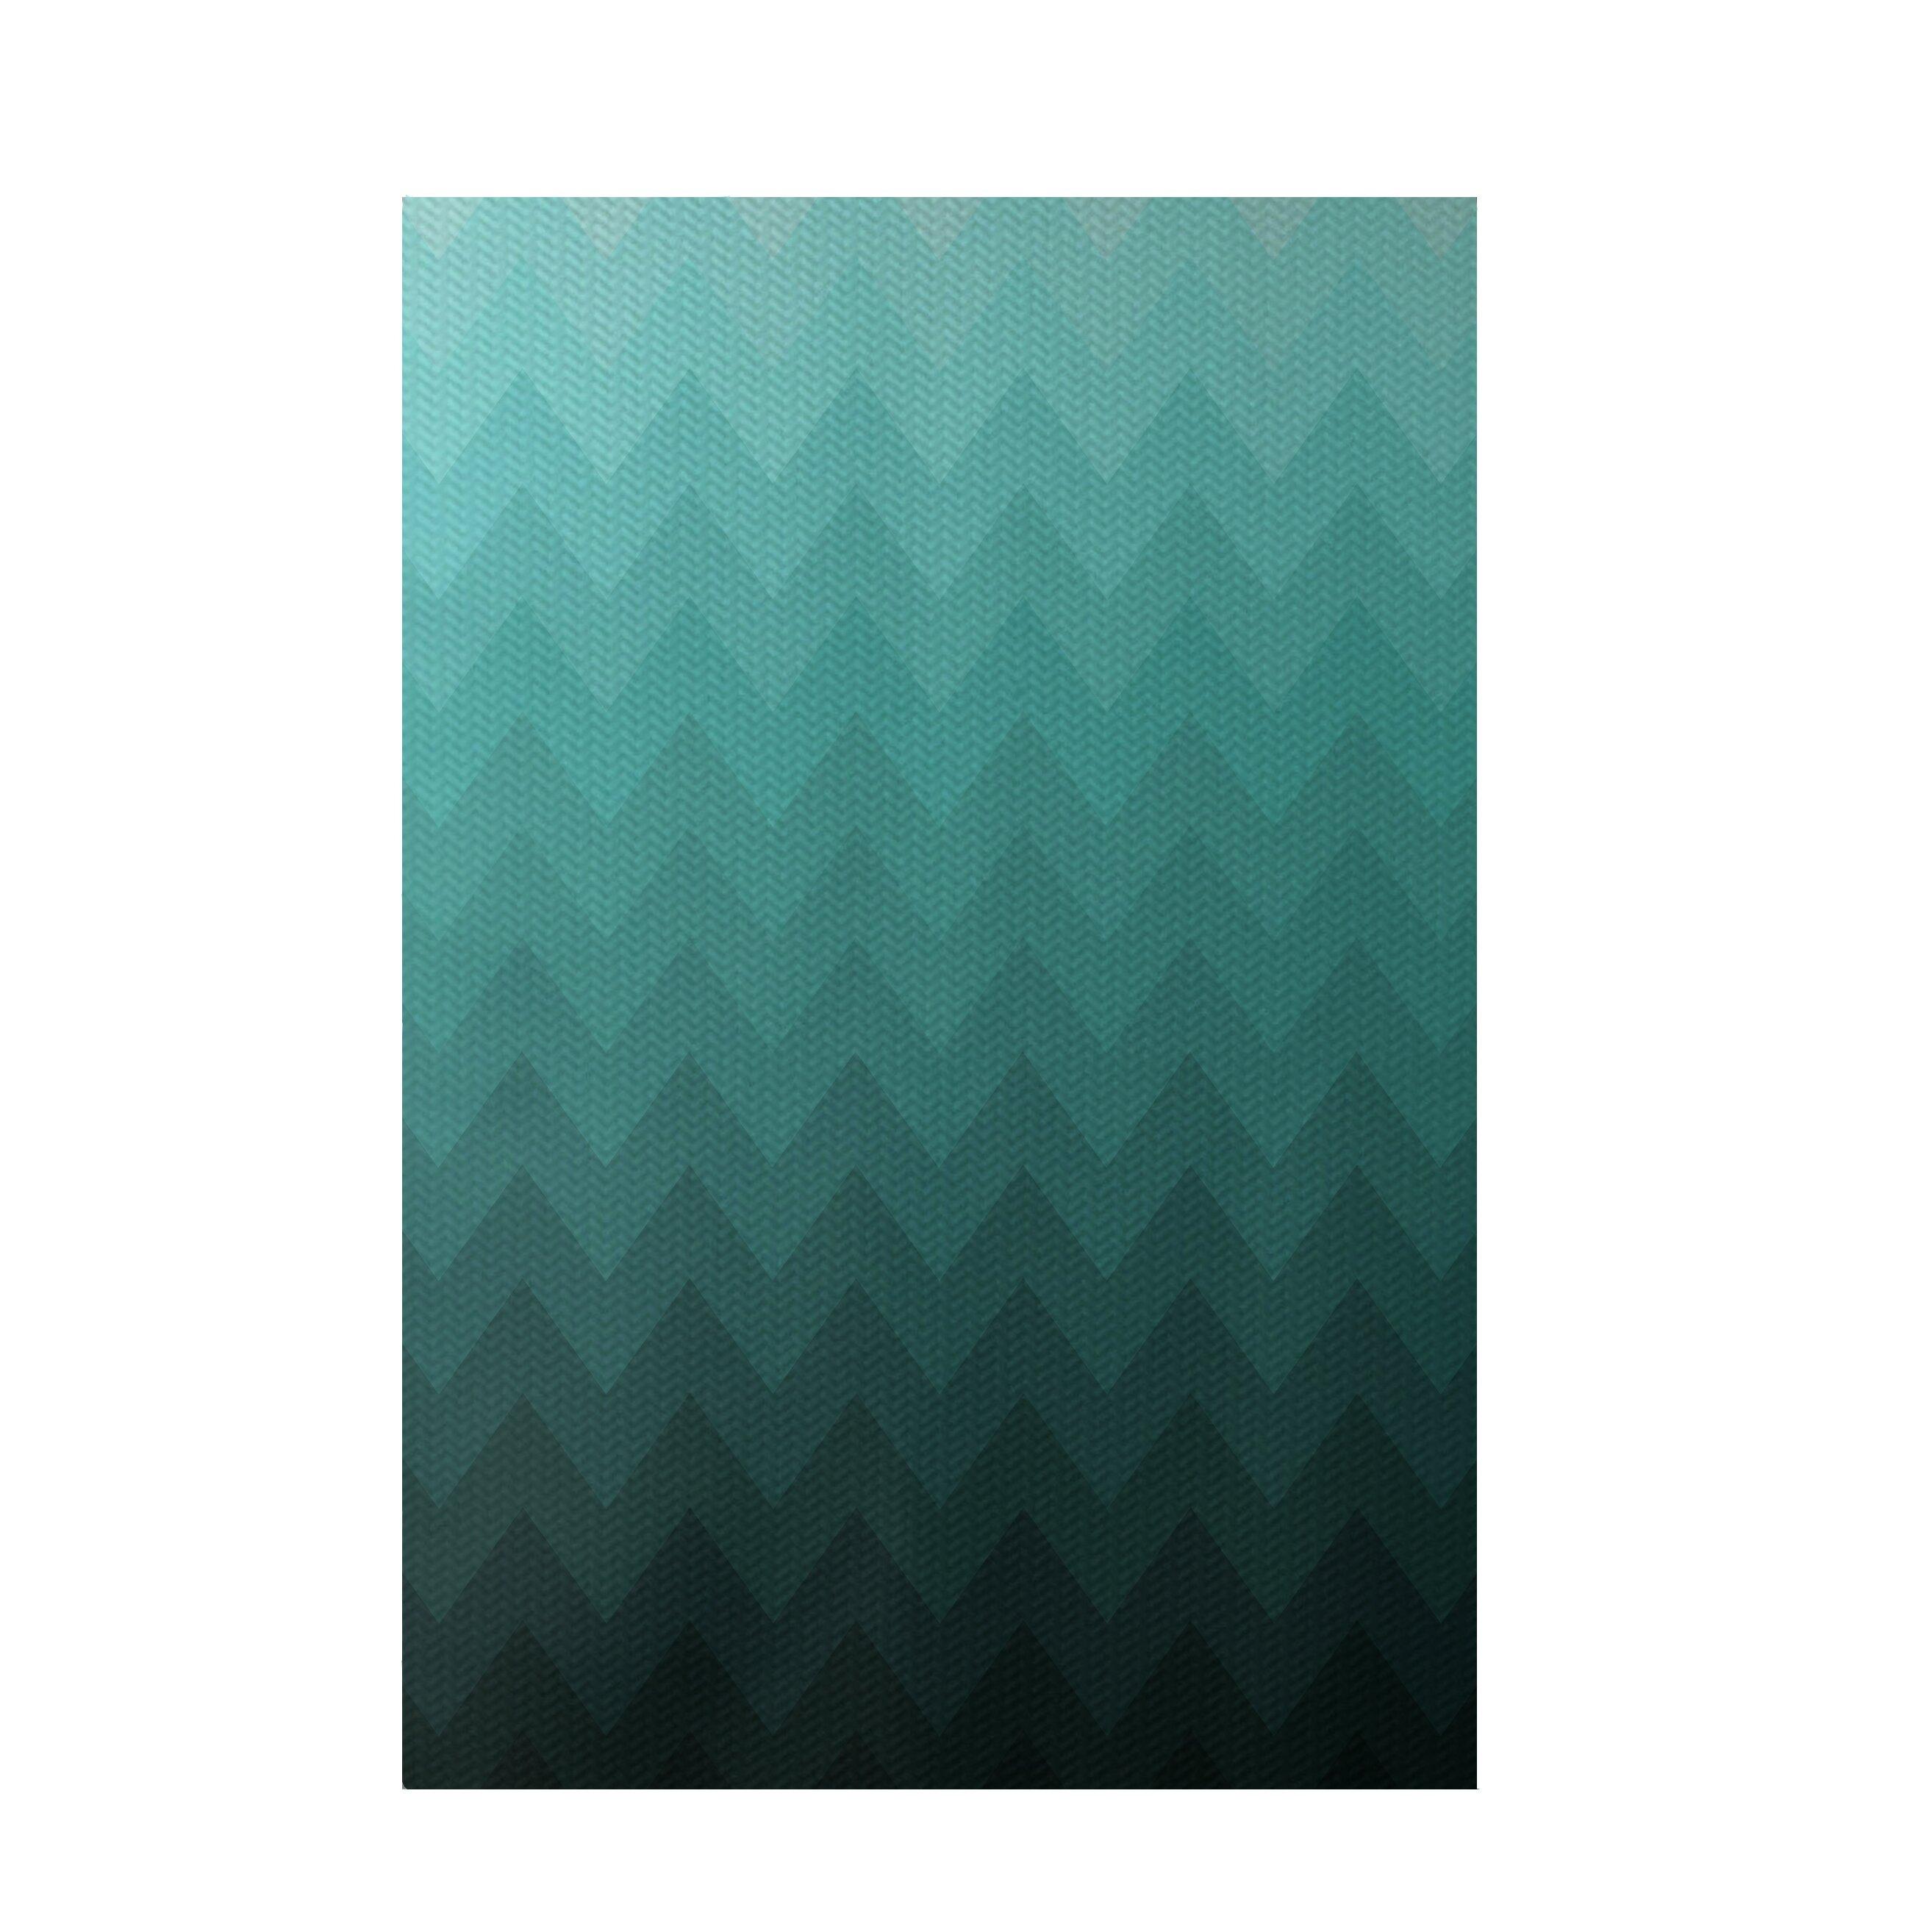 E By Design Chevron Aqua Indoor/Outdoor Area Rug & Reviews